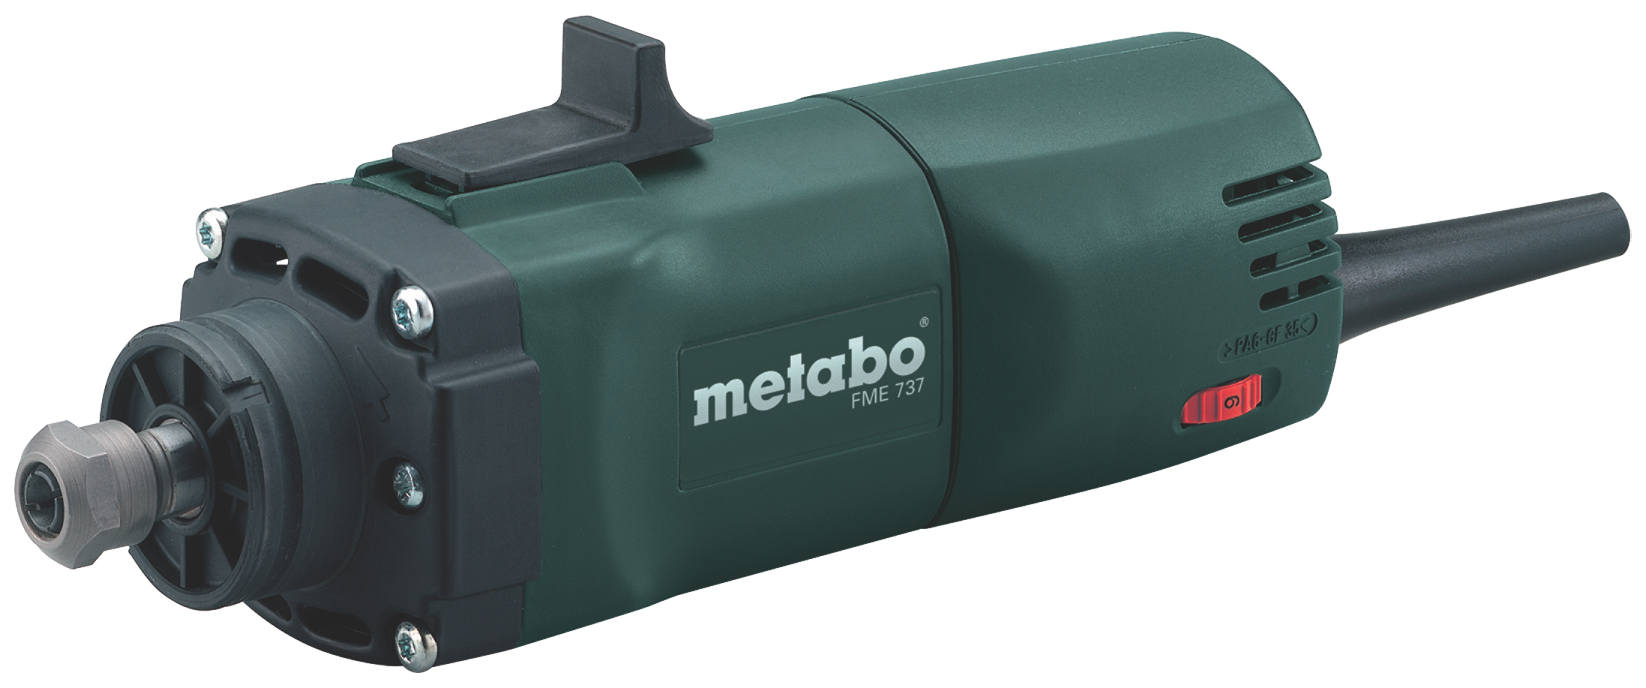 Кромочный фрезер Metabo Fme 737 (600737000)